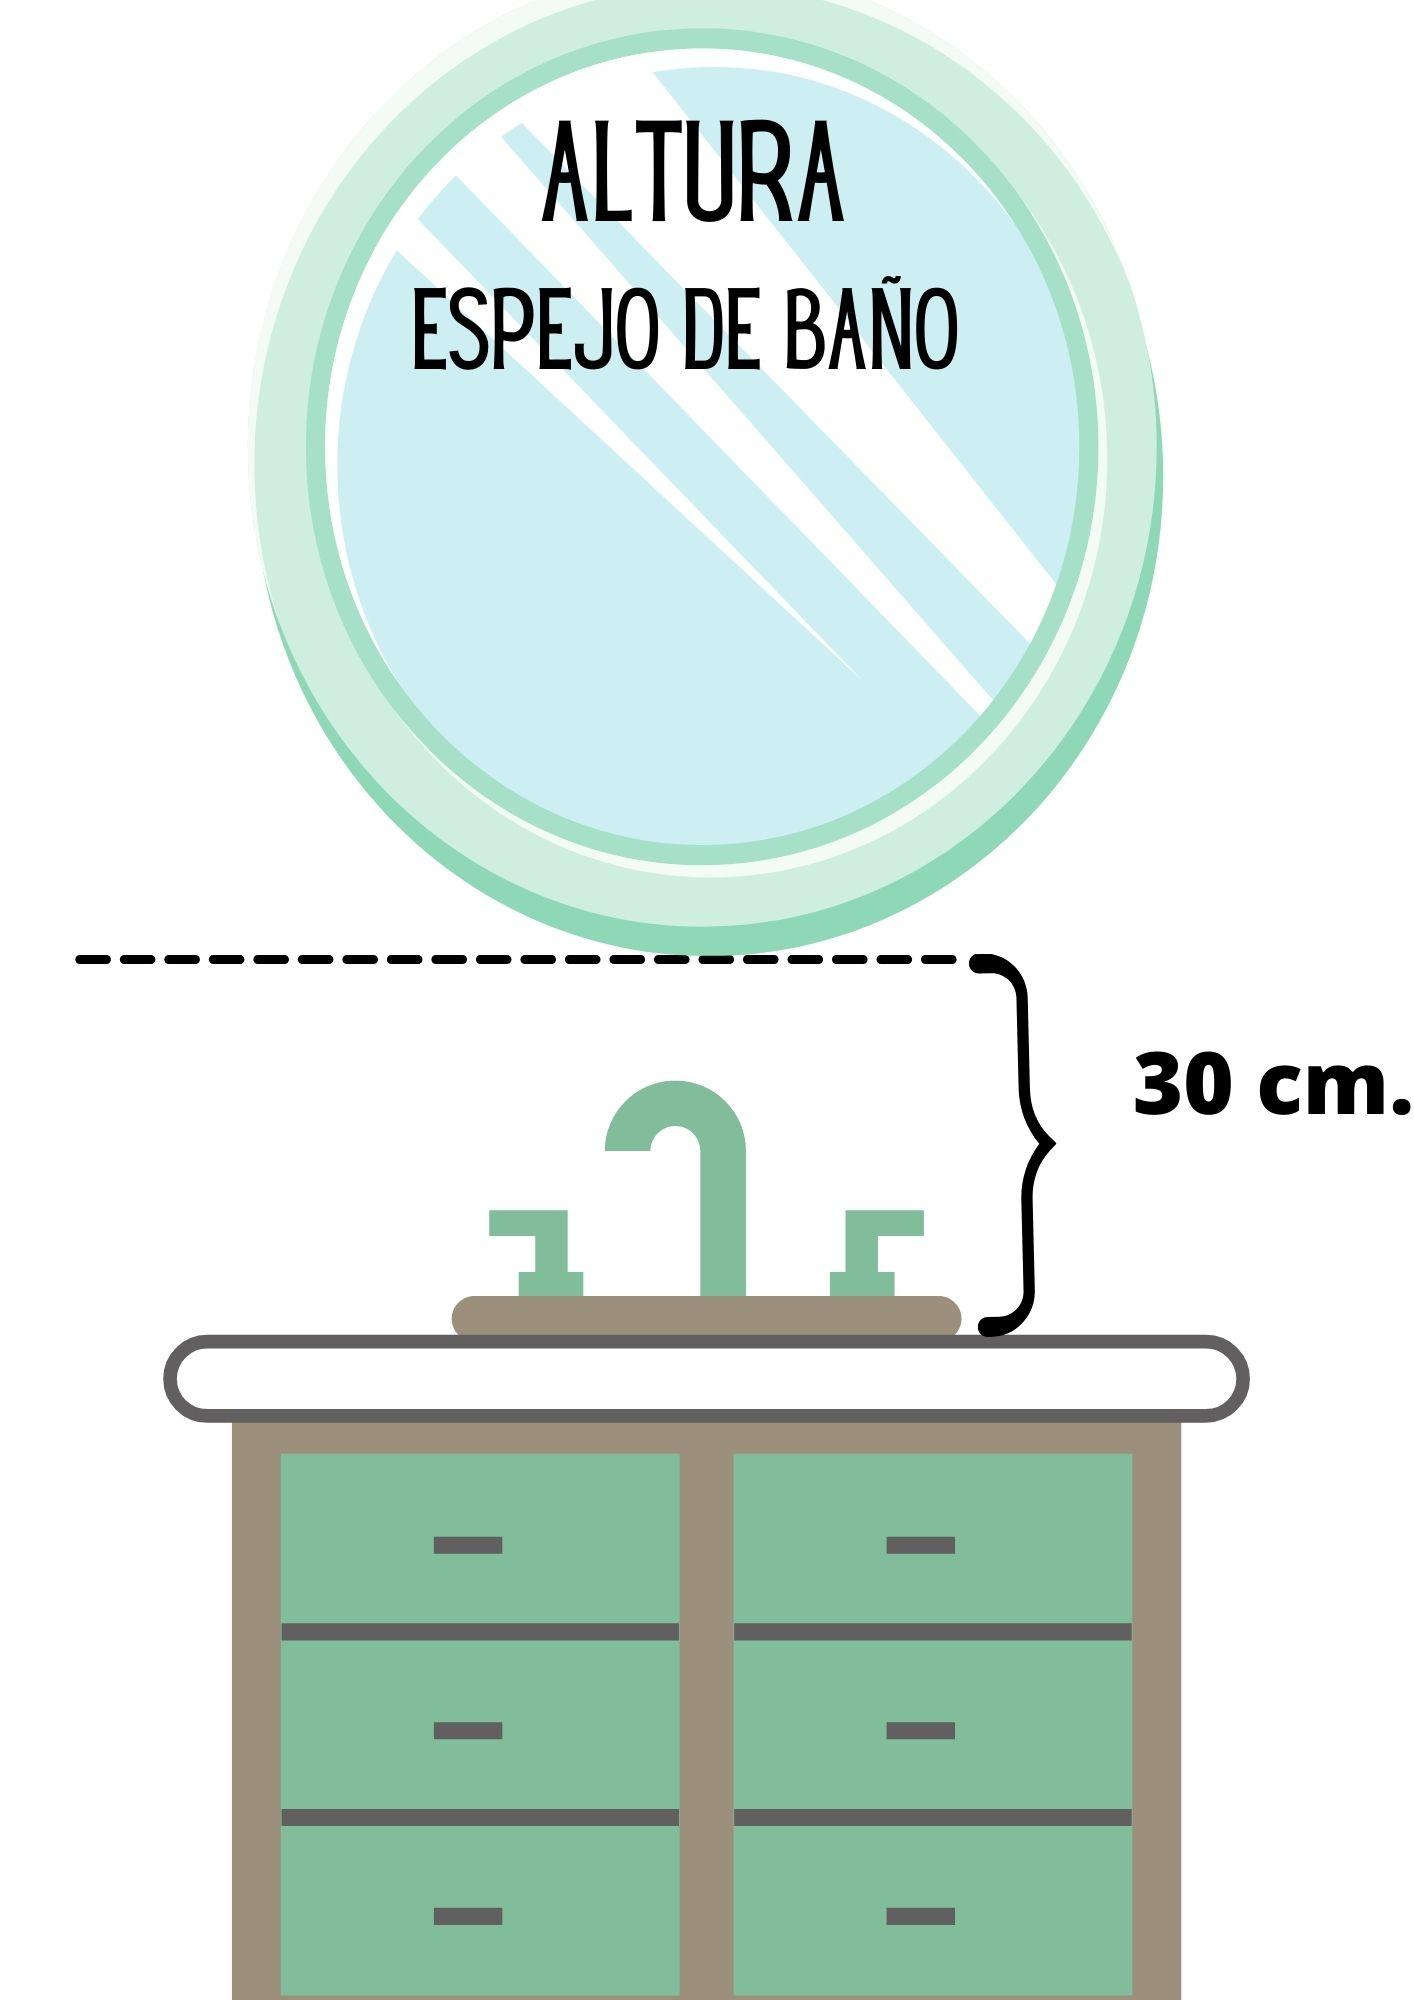 Altura espejo baño